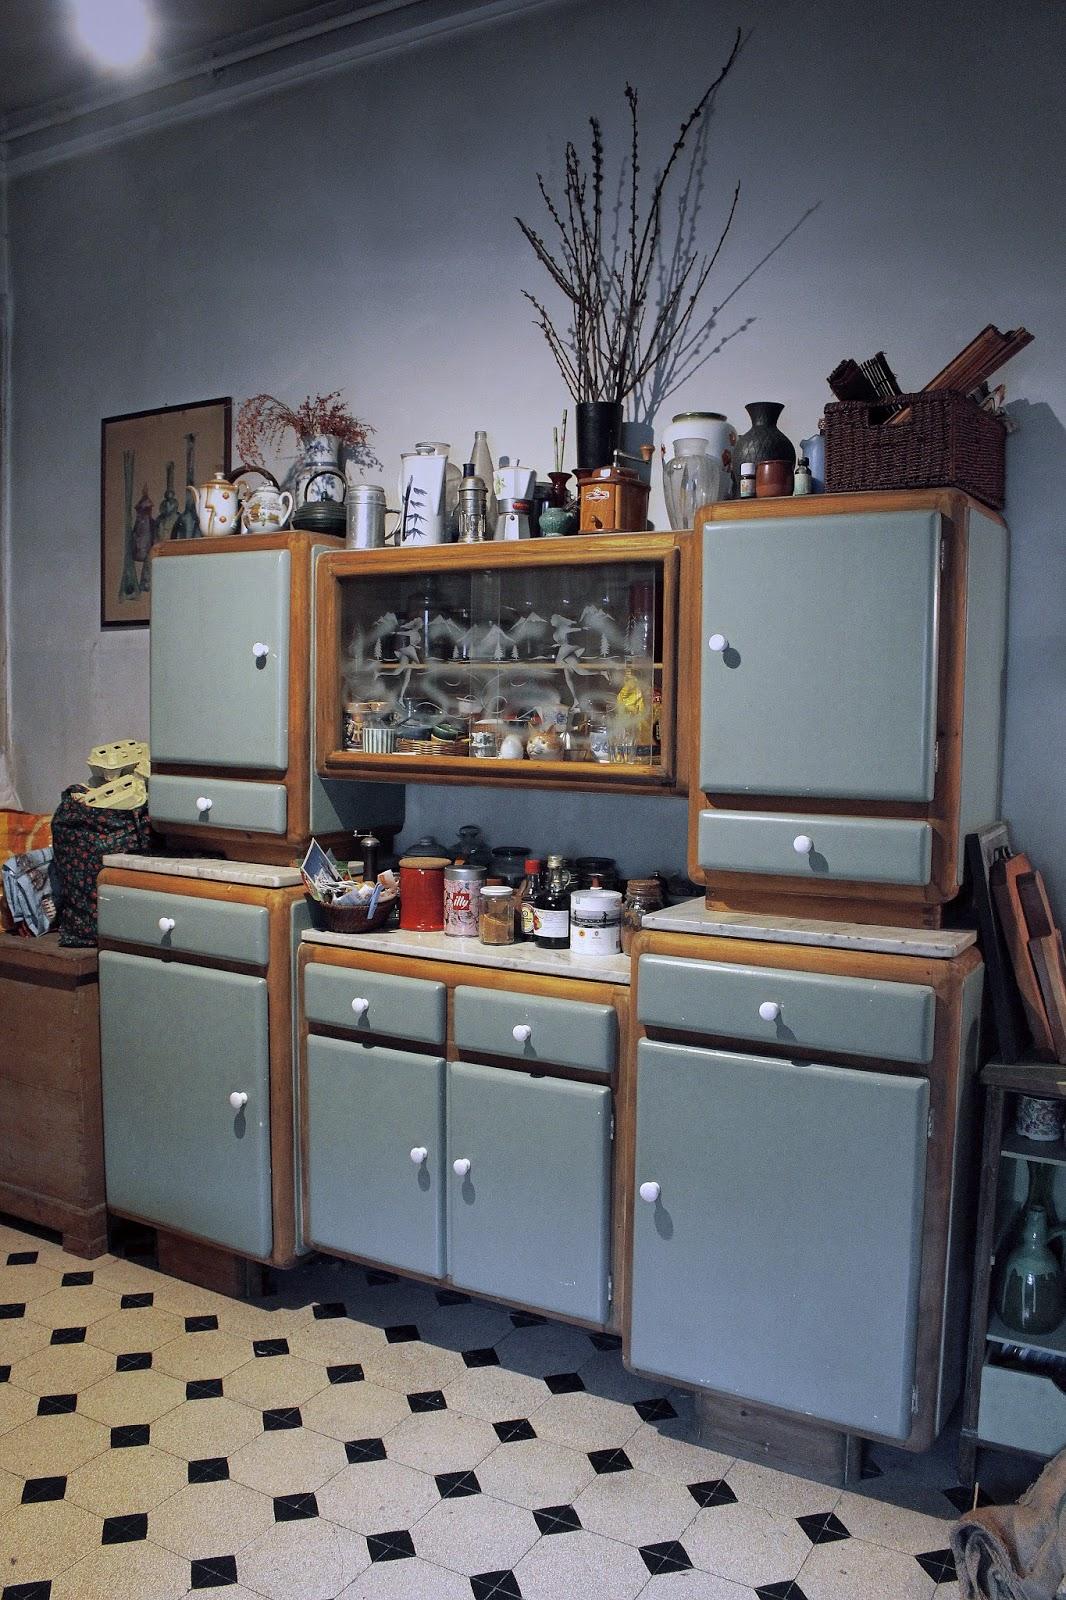 Emejing Credenza Cucina Anni 50 Gallery - Cannado.co - cannado.co